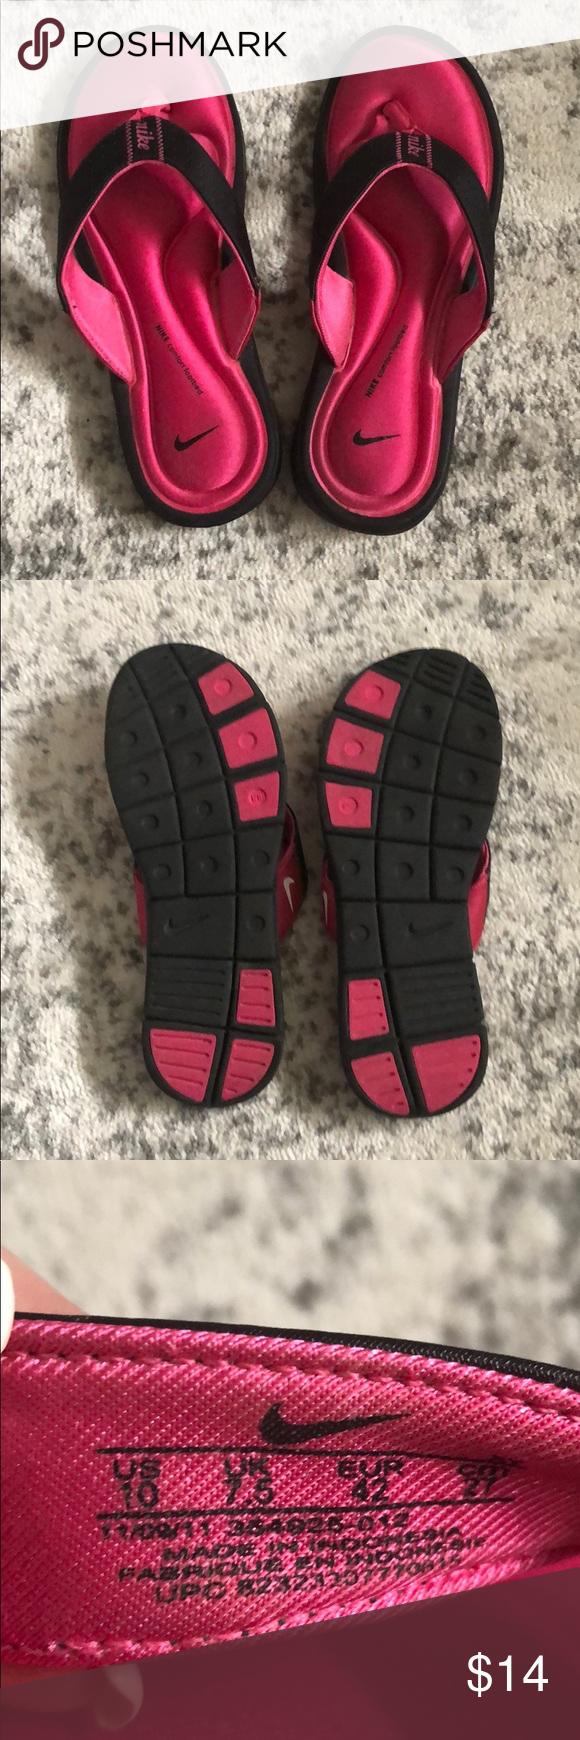 nike squishy flip flops